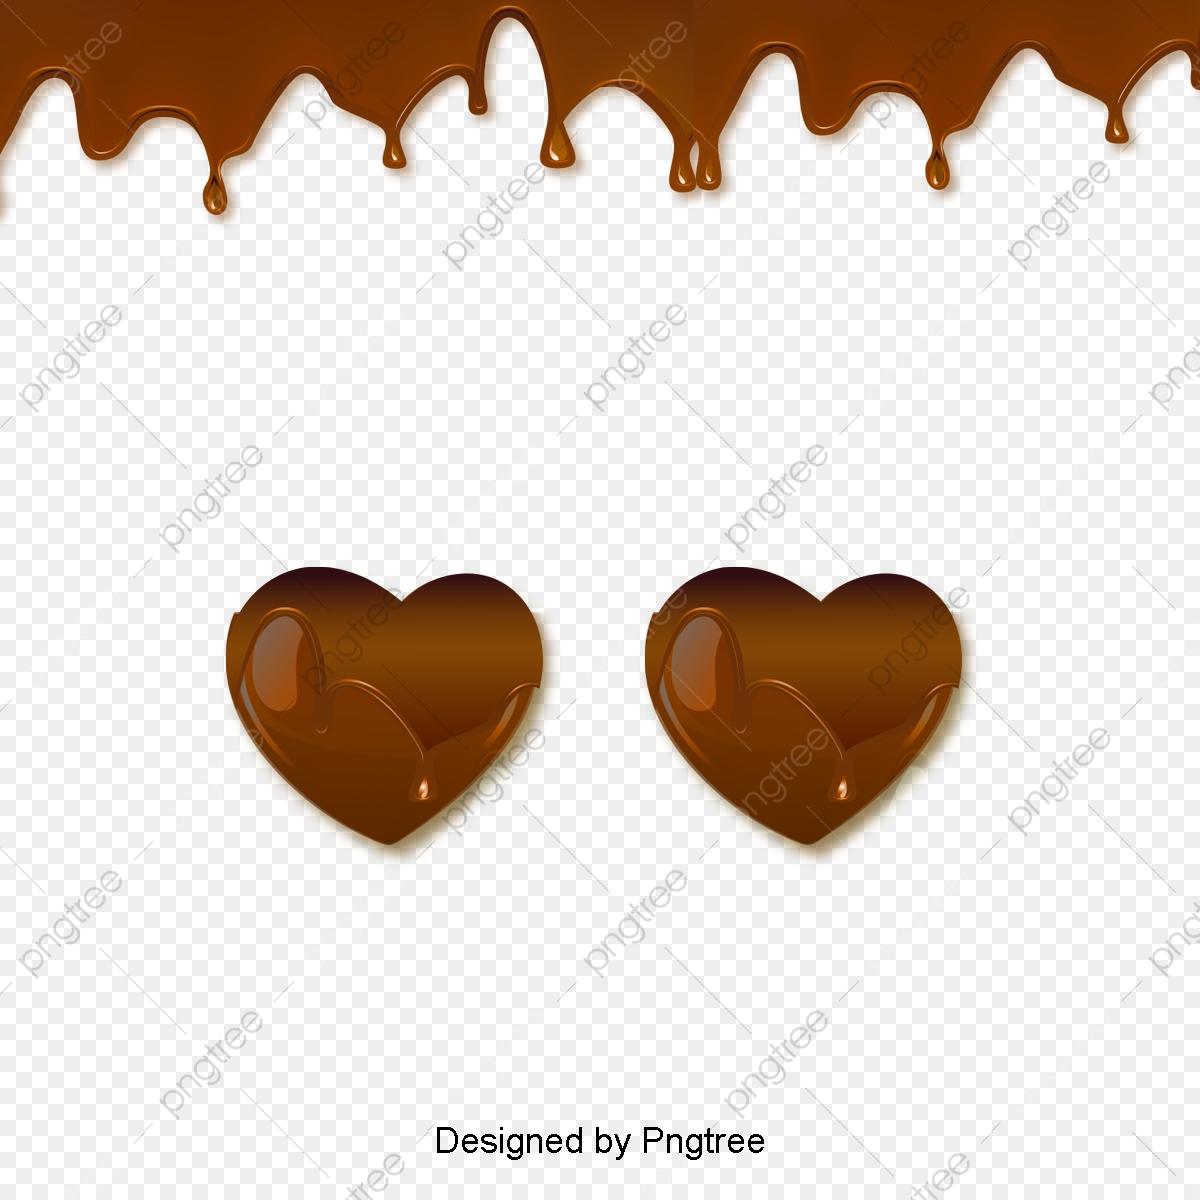 Melting heart clipart. Free download transparent .PNG   Creazilla